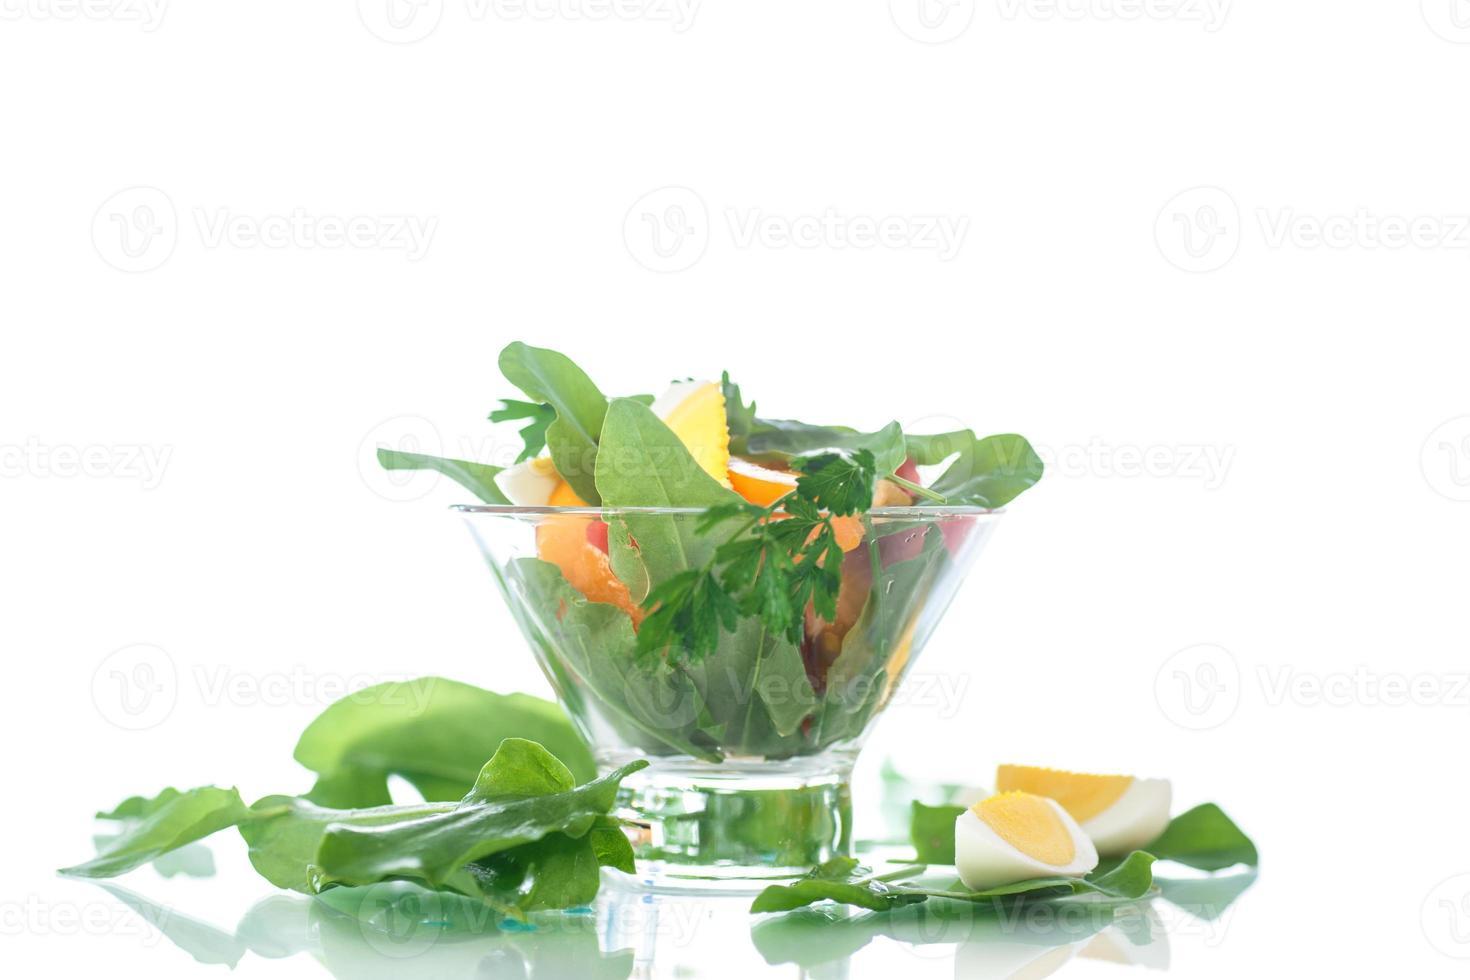 zuring salade en tomaten met ei foto